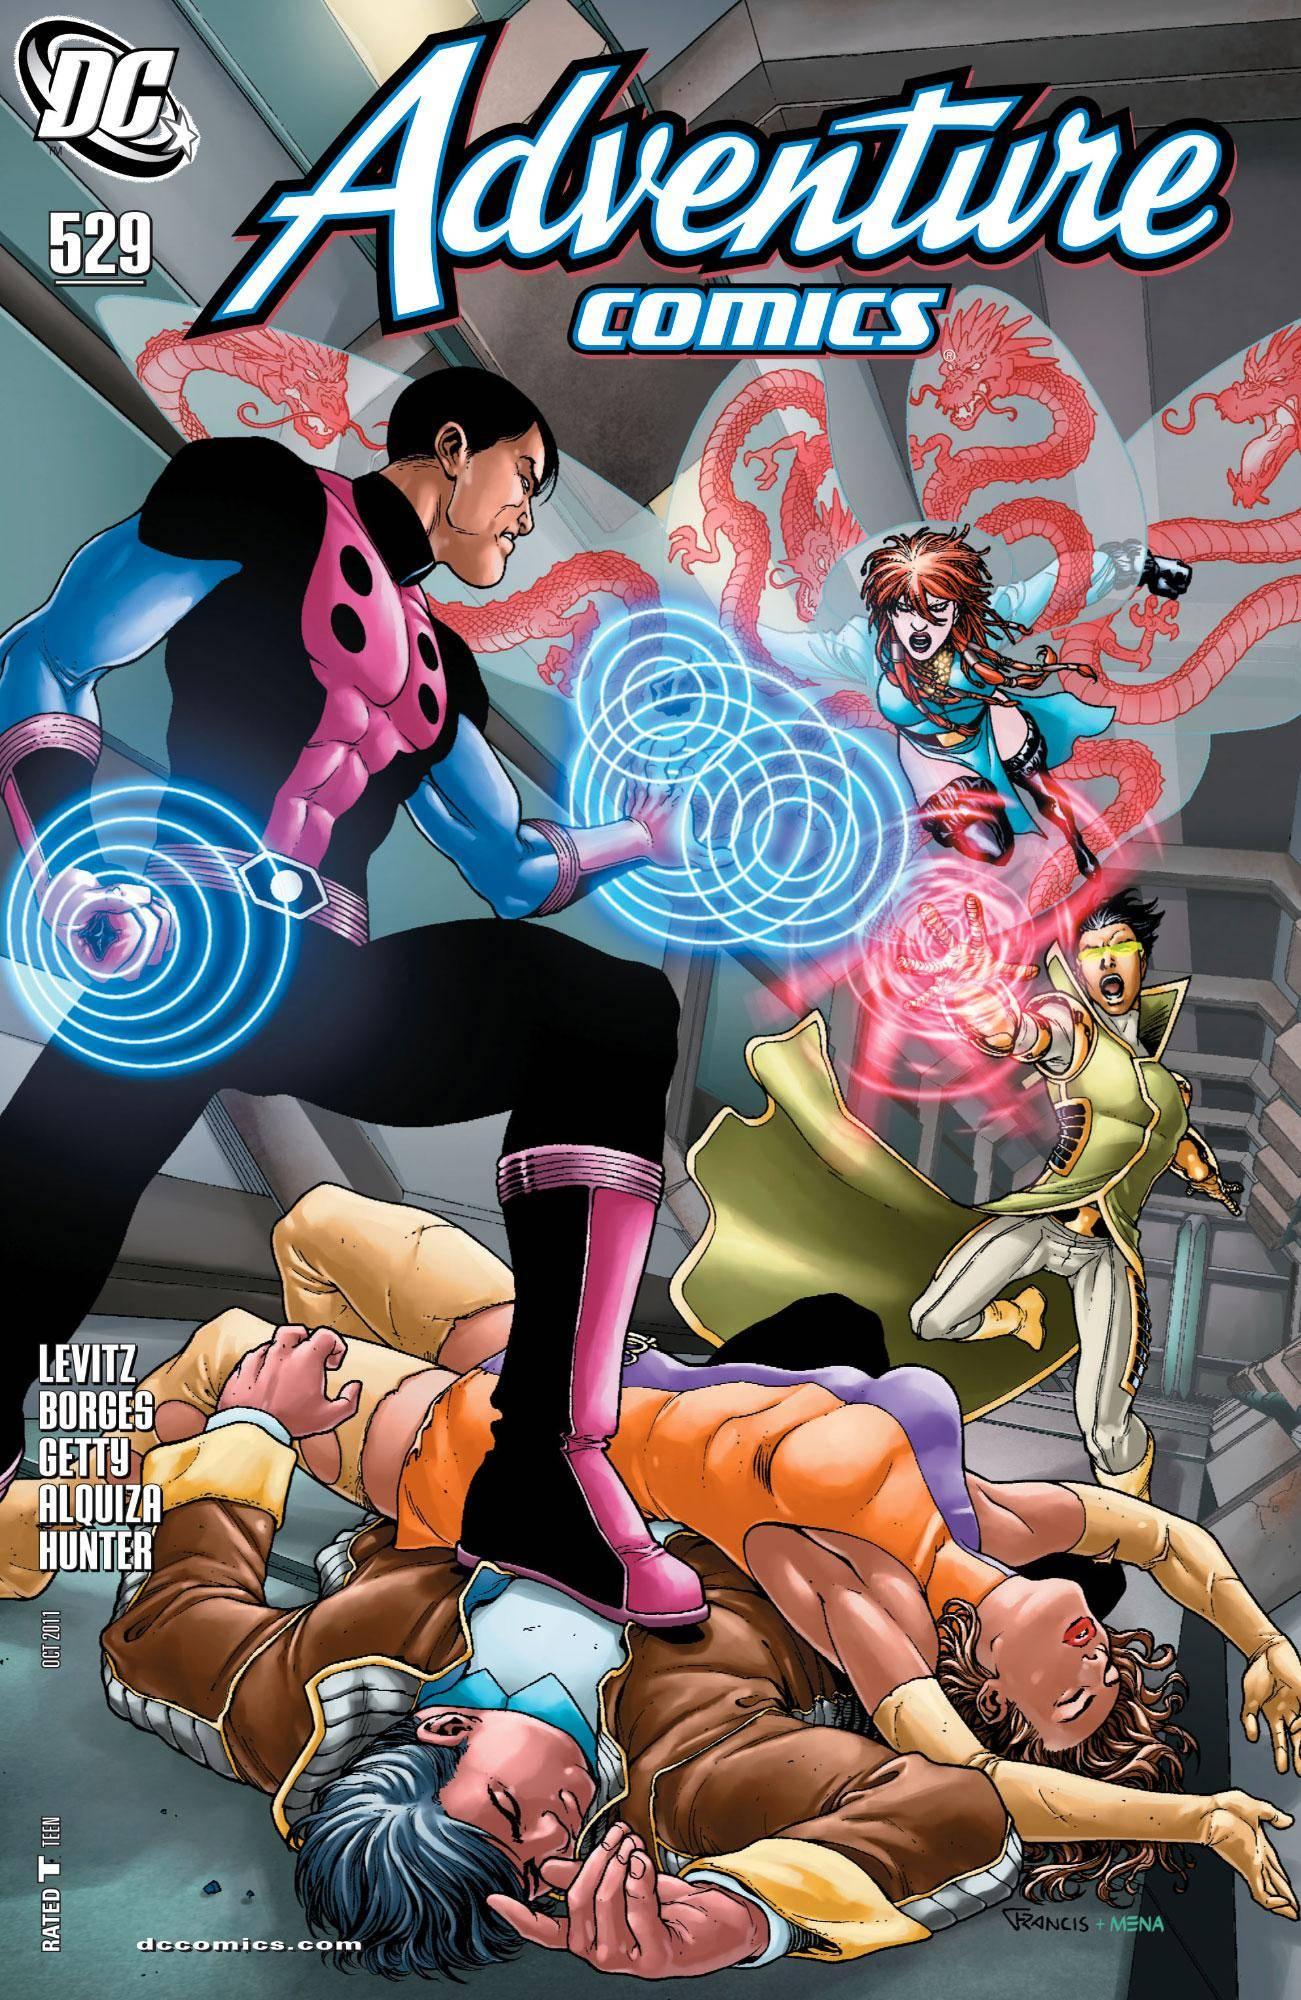 Adventure Comics 2011-10 529 LSH digital